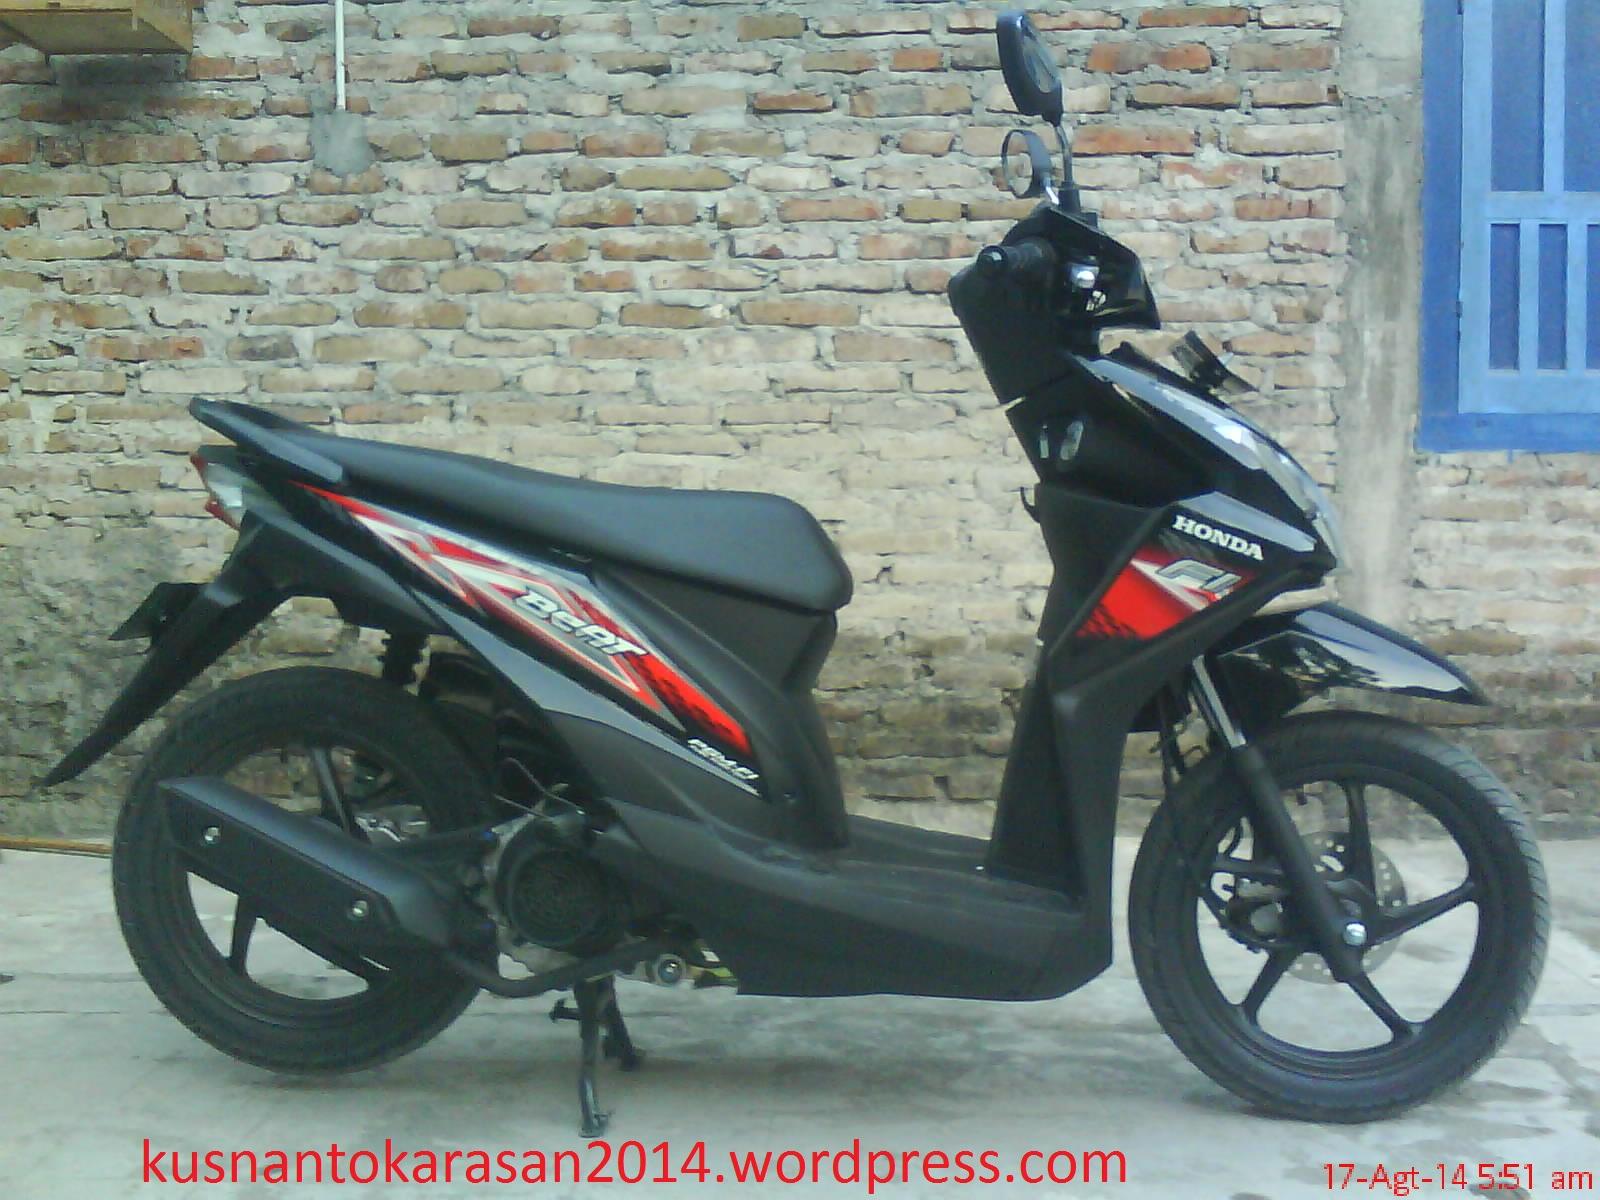 Gambar Asli Honda Beat 2104 Warna Hitam Kusnantokarasan Com